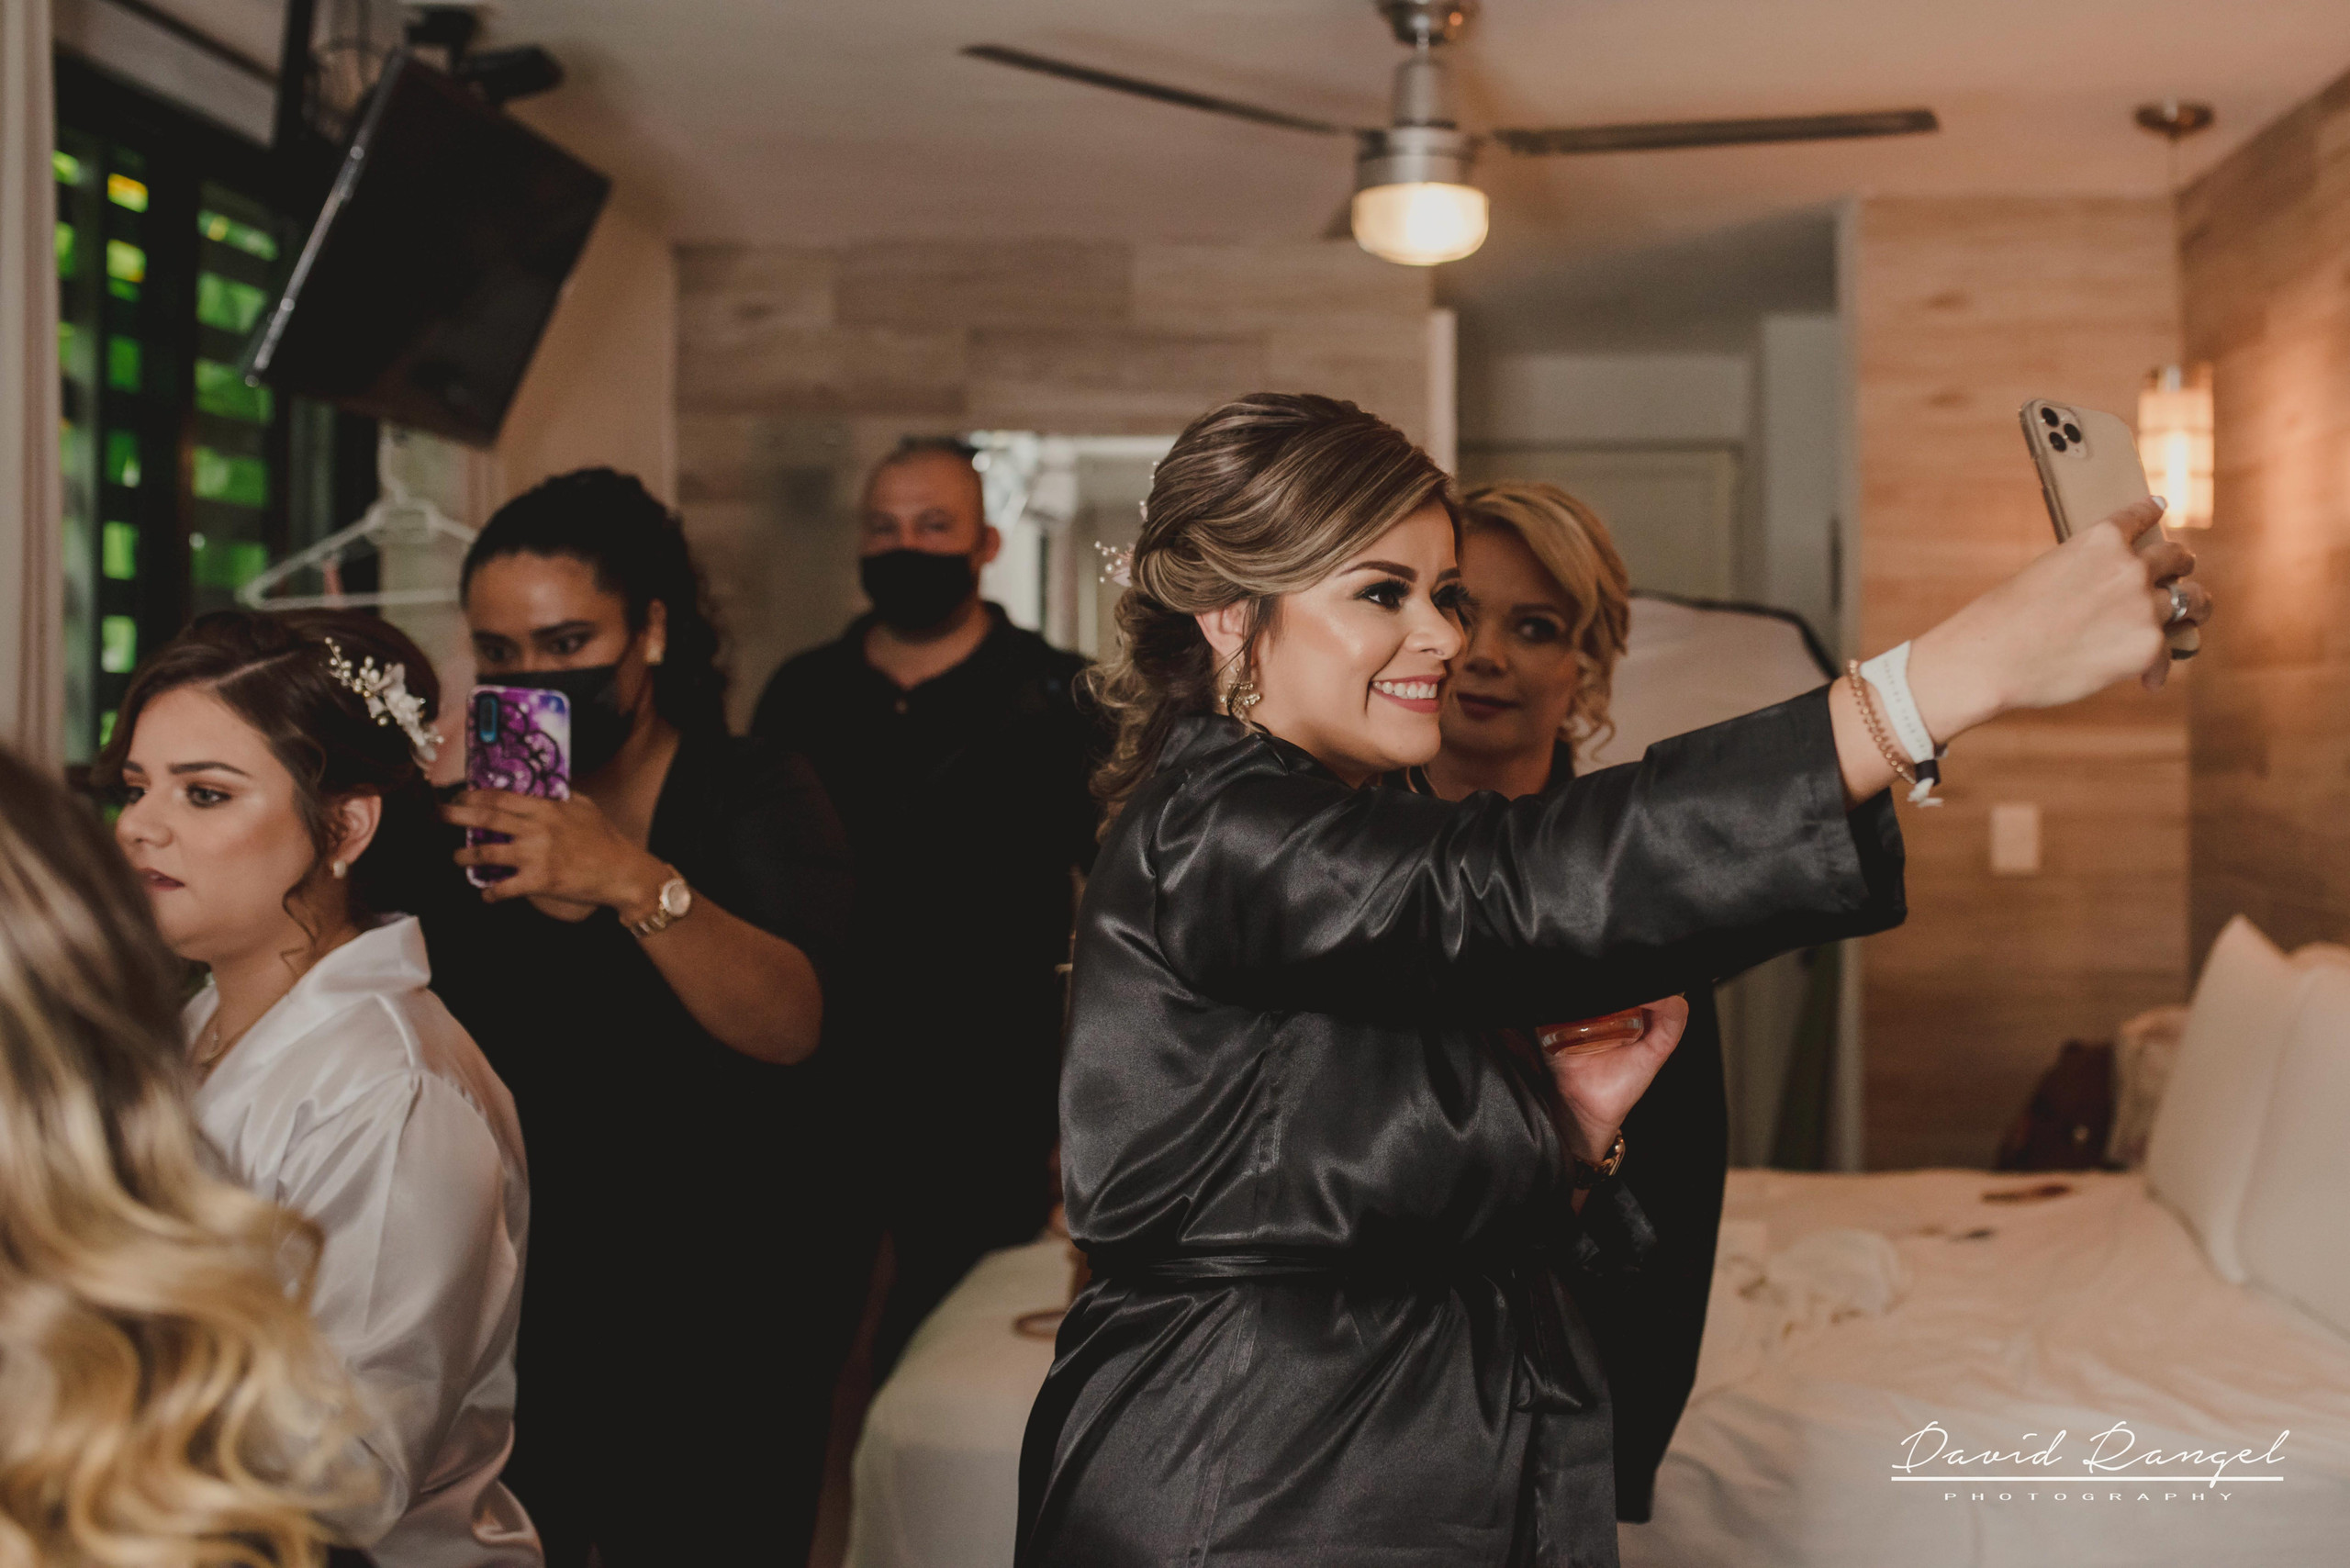 bride+getting+ready+shadow+earring++bathrobe+natural+ligh+photo+destination+wedding+isla+blanca+smile+selfie+maid+of+honor+bridesmaids+mother+room